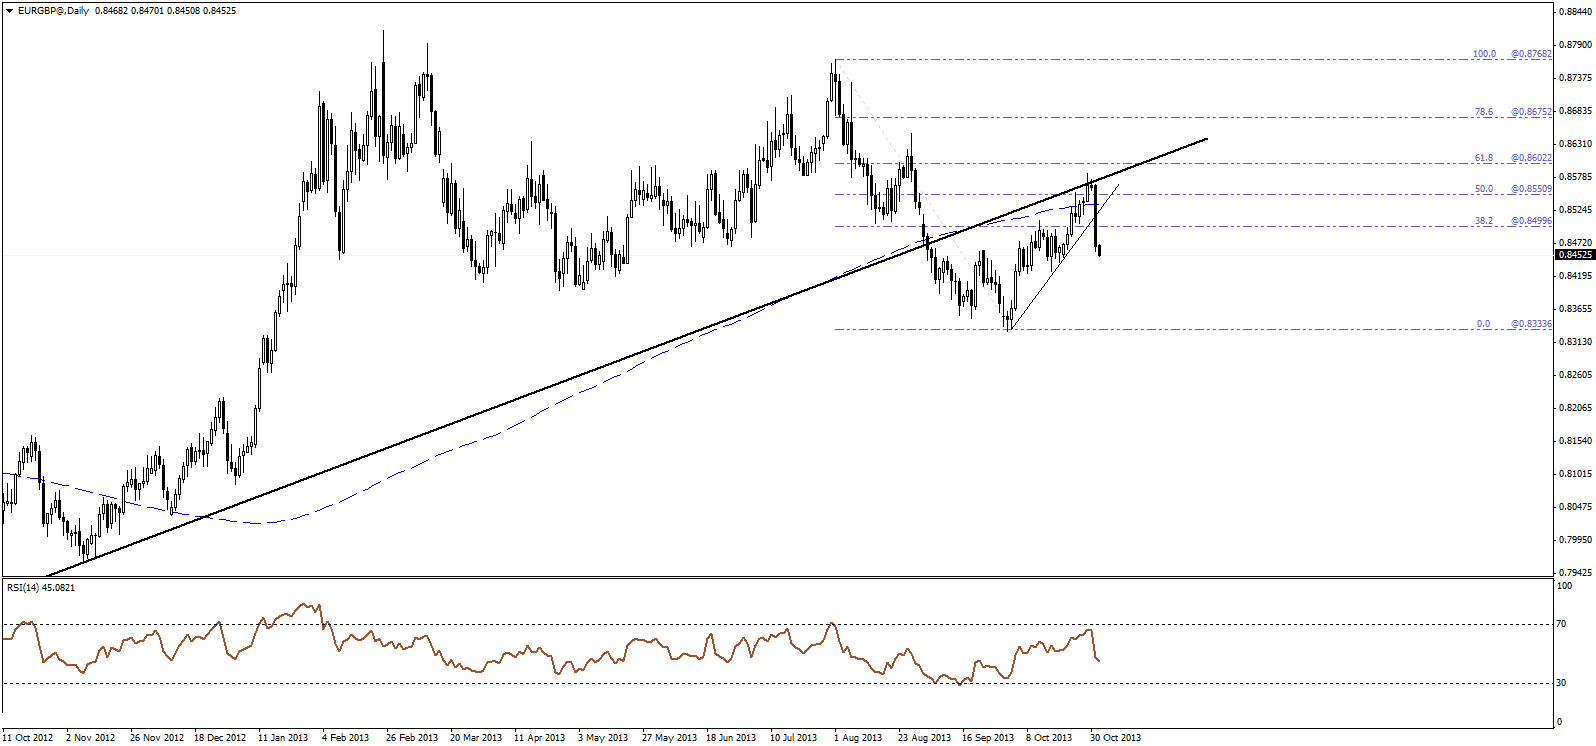 Live 1/11: GBP/EUR sees